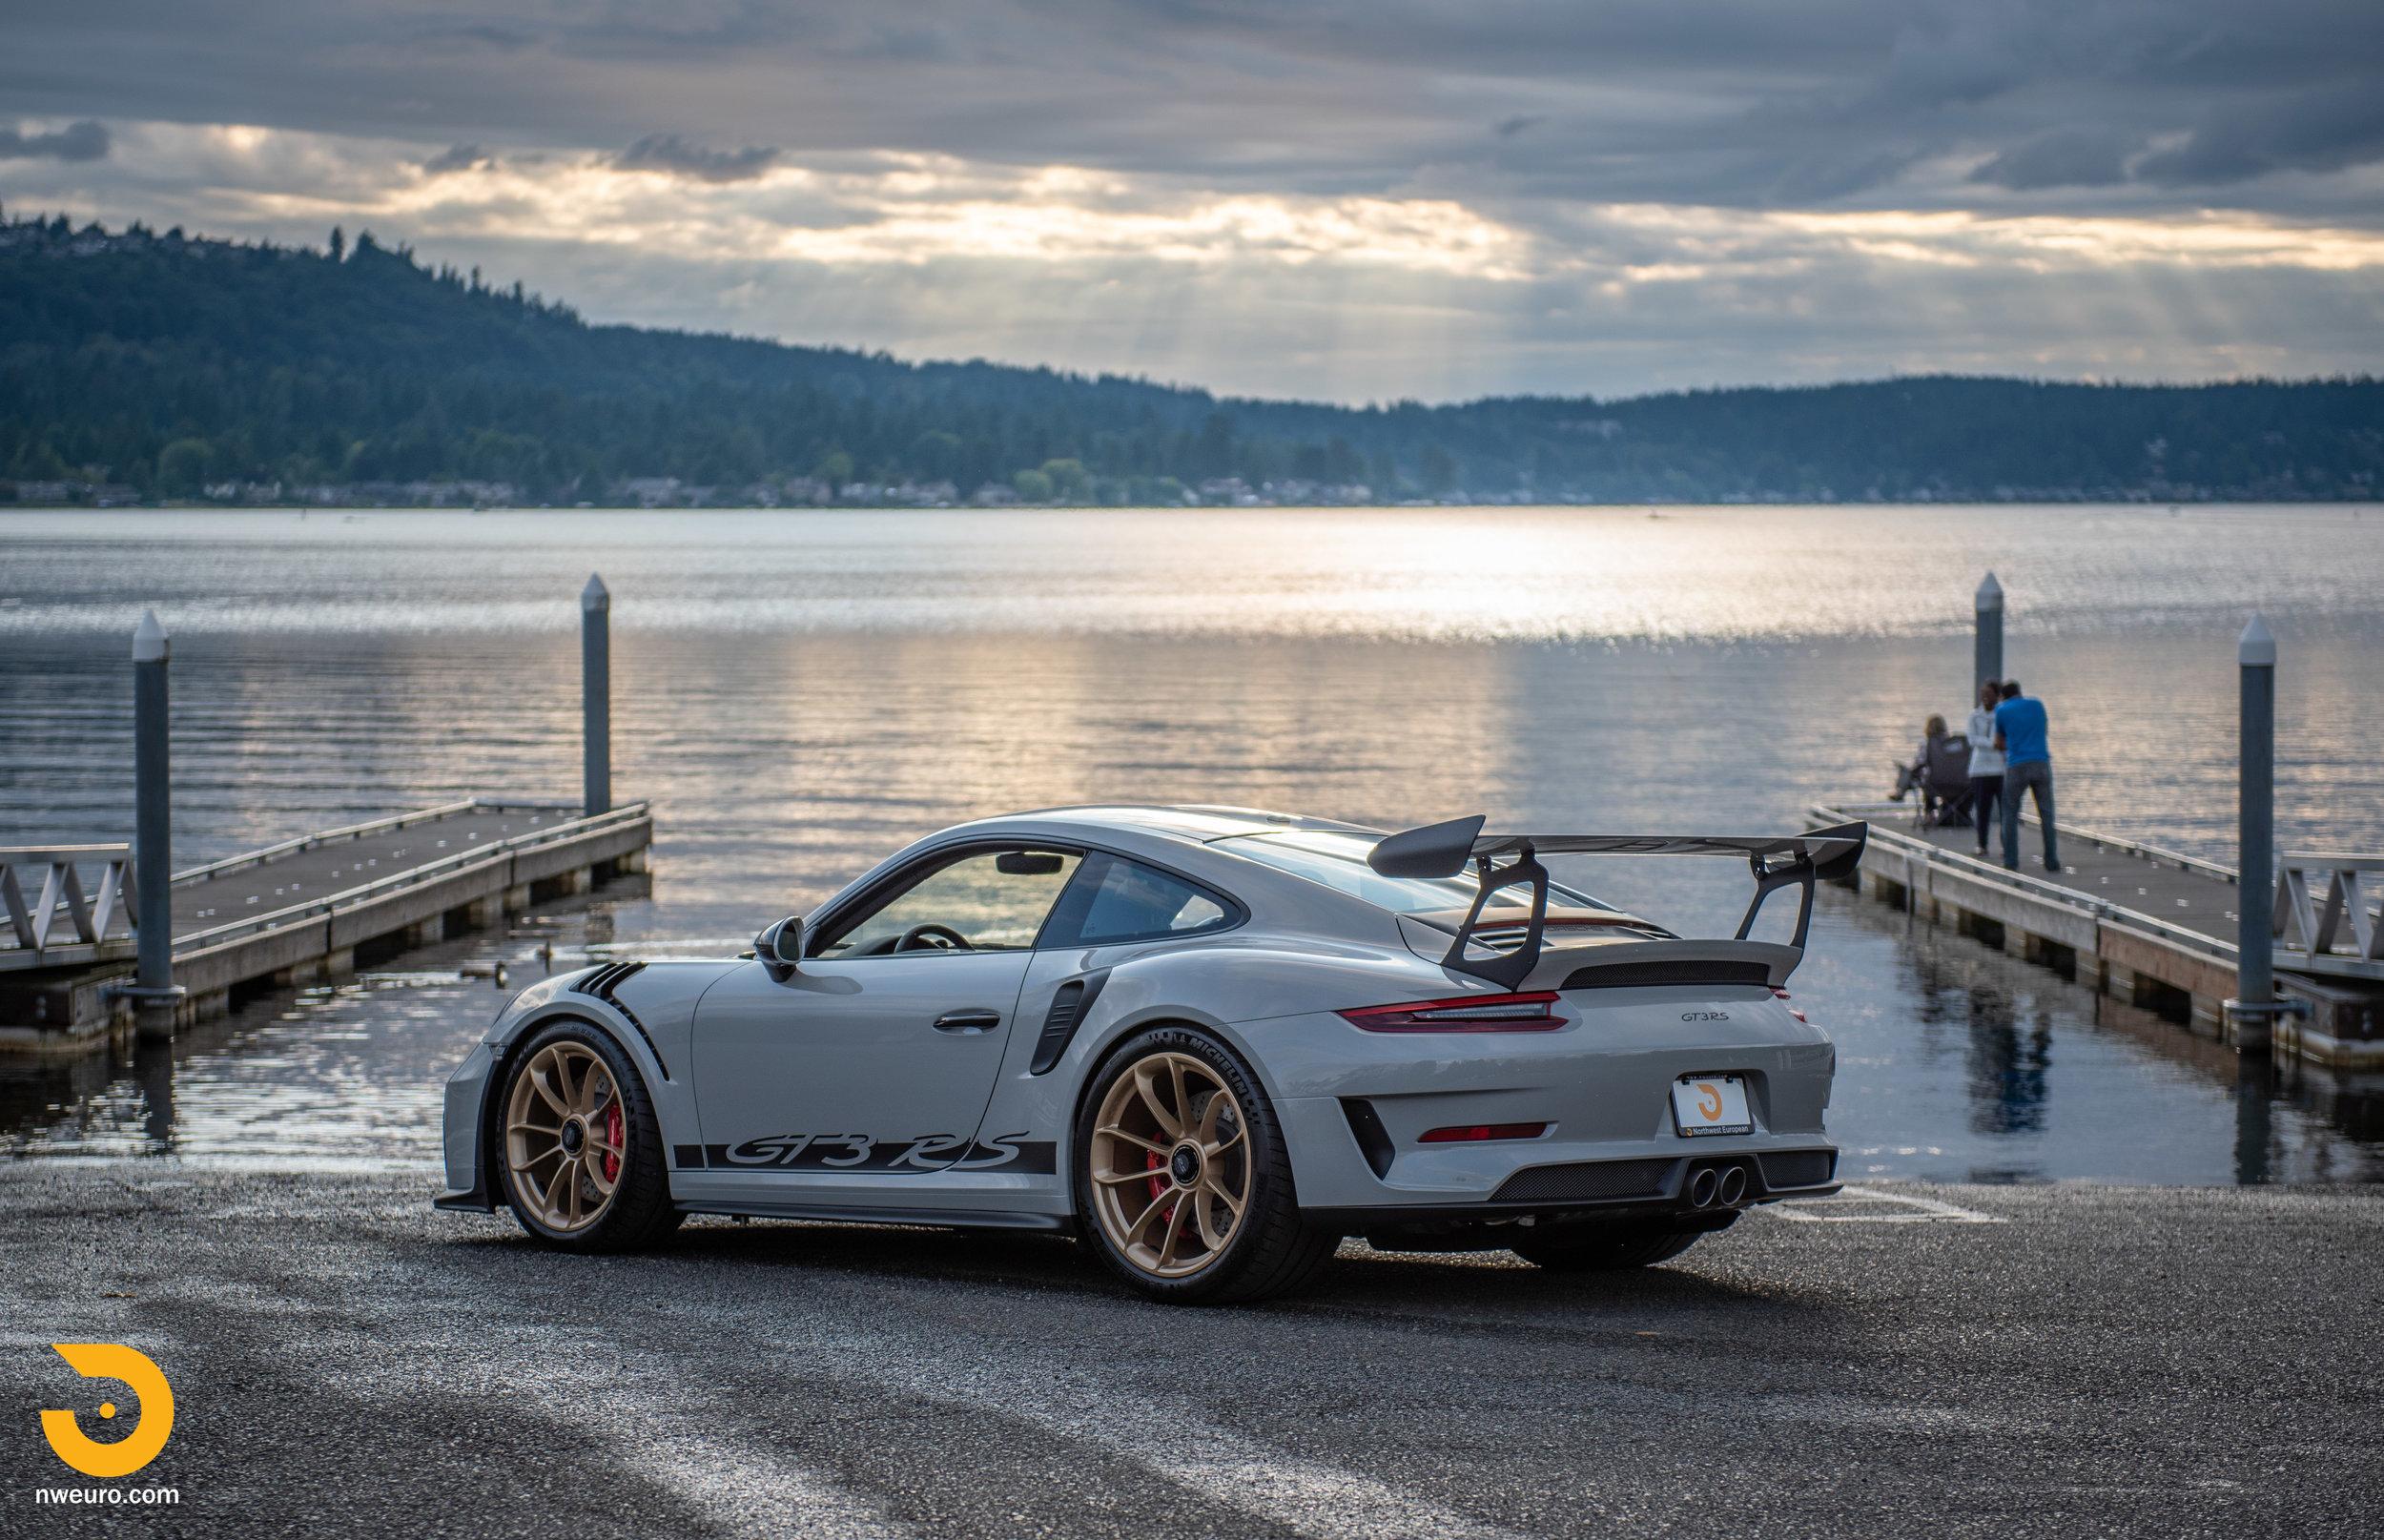 2019 Porsche GT3 RS - Chalk-79.jpg